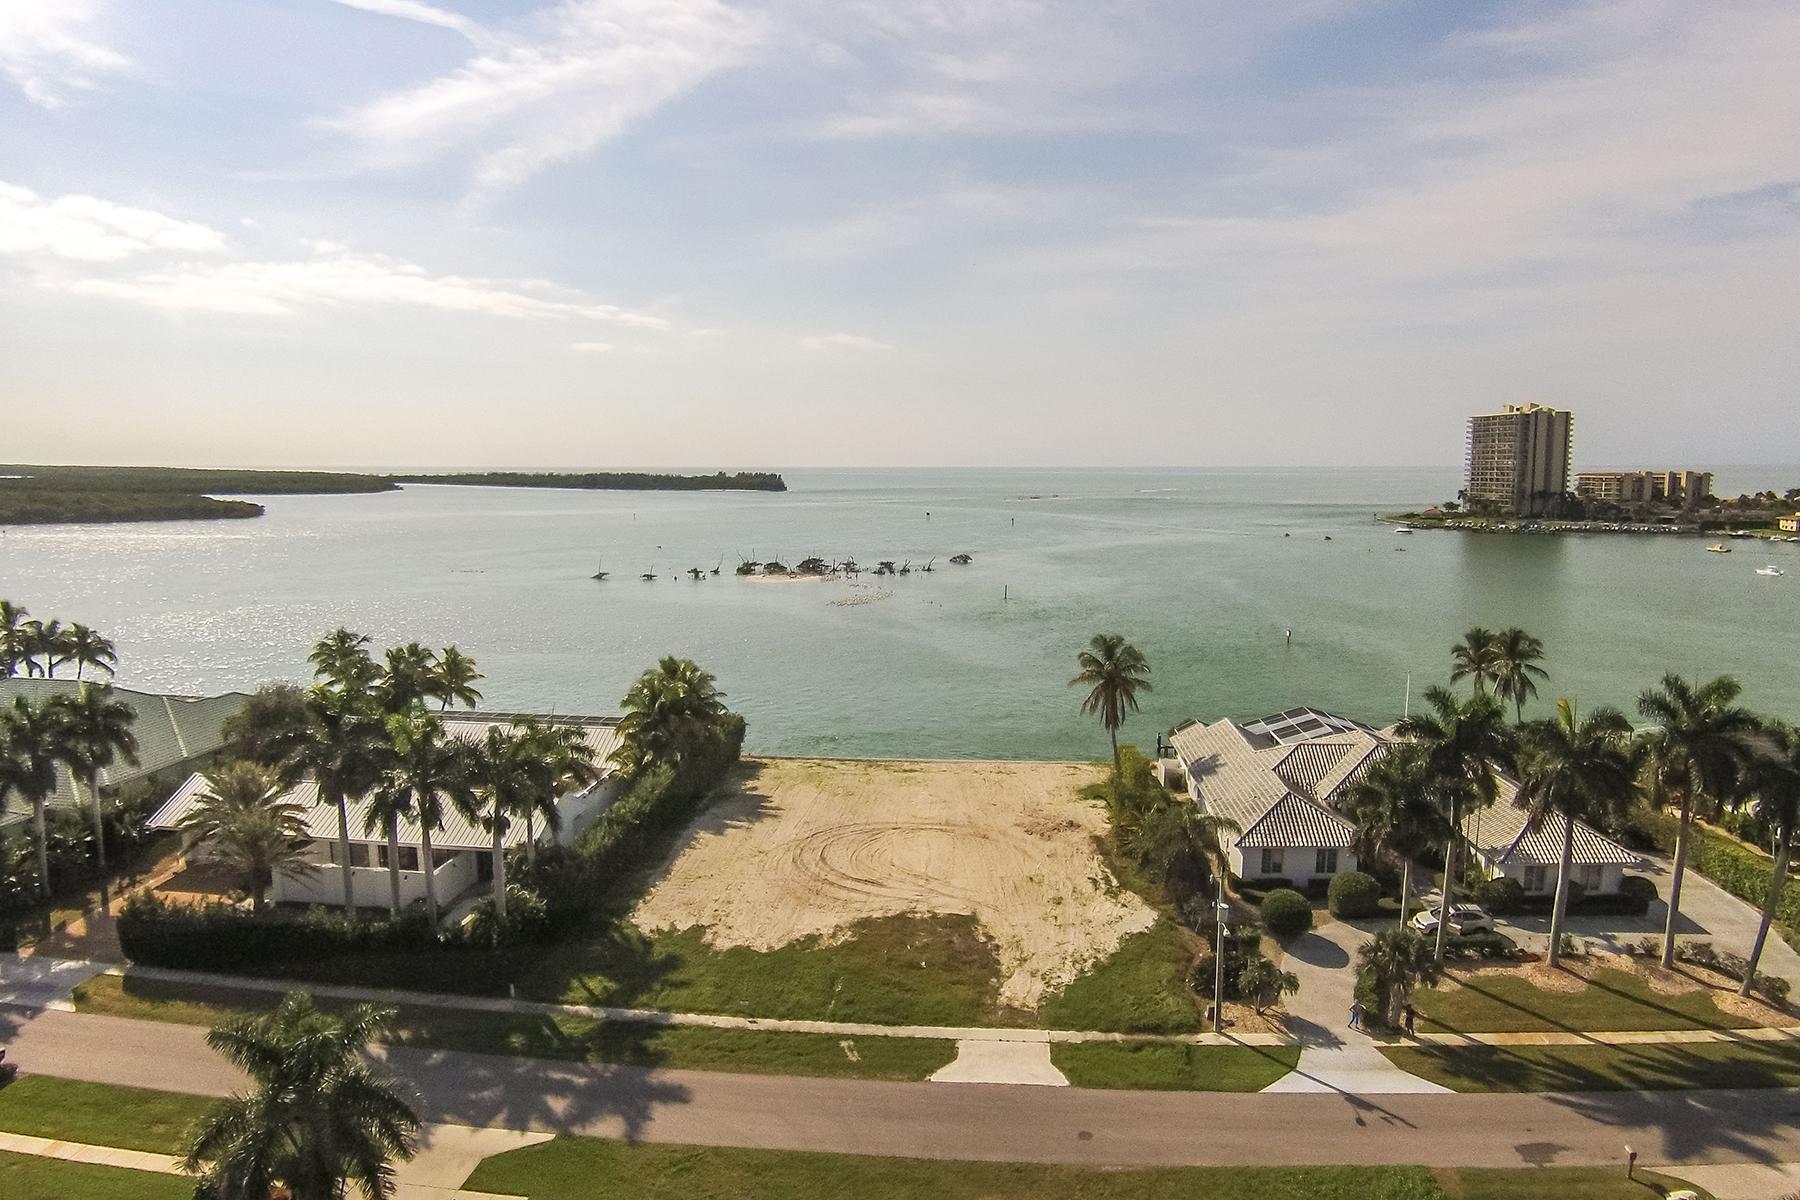 Terreno para Venda às MARCO ISLAND 1381 Caxambas Ct Marco Island, Florida, 34145 Estados Unidos